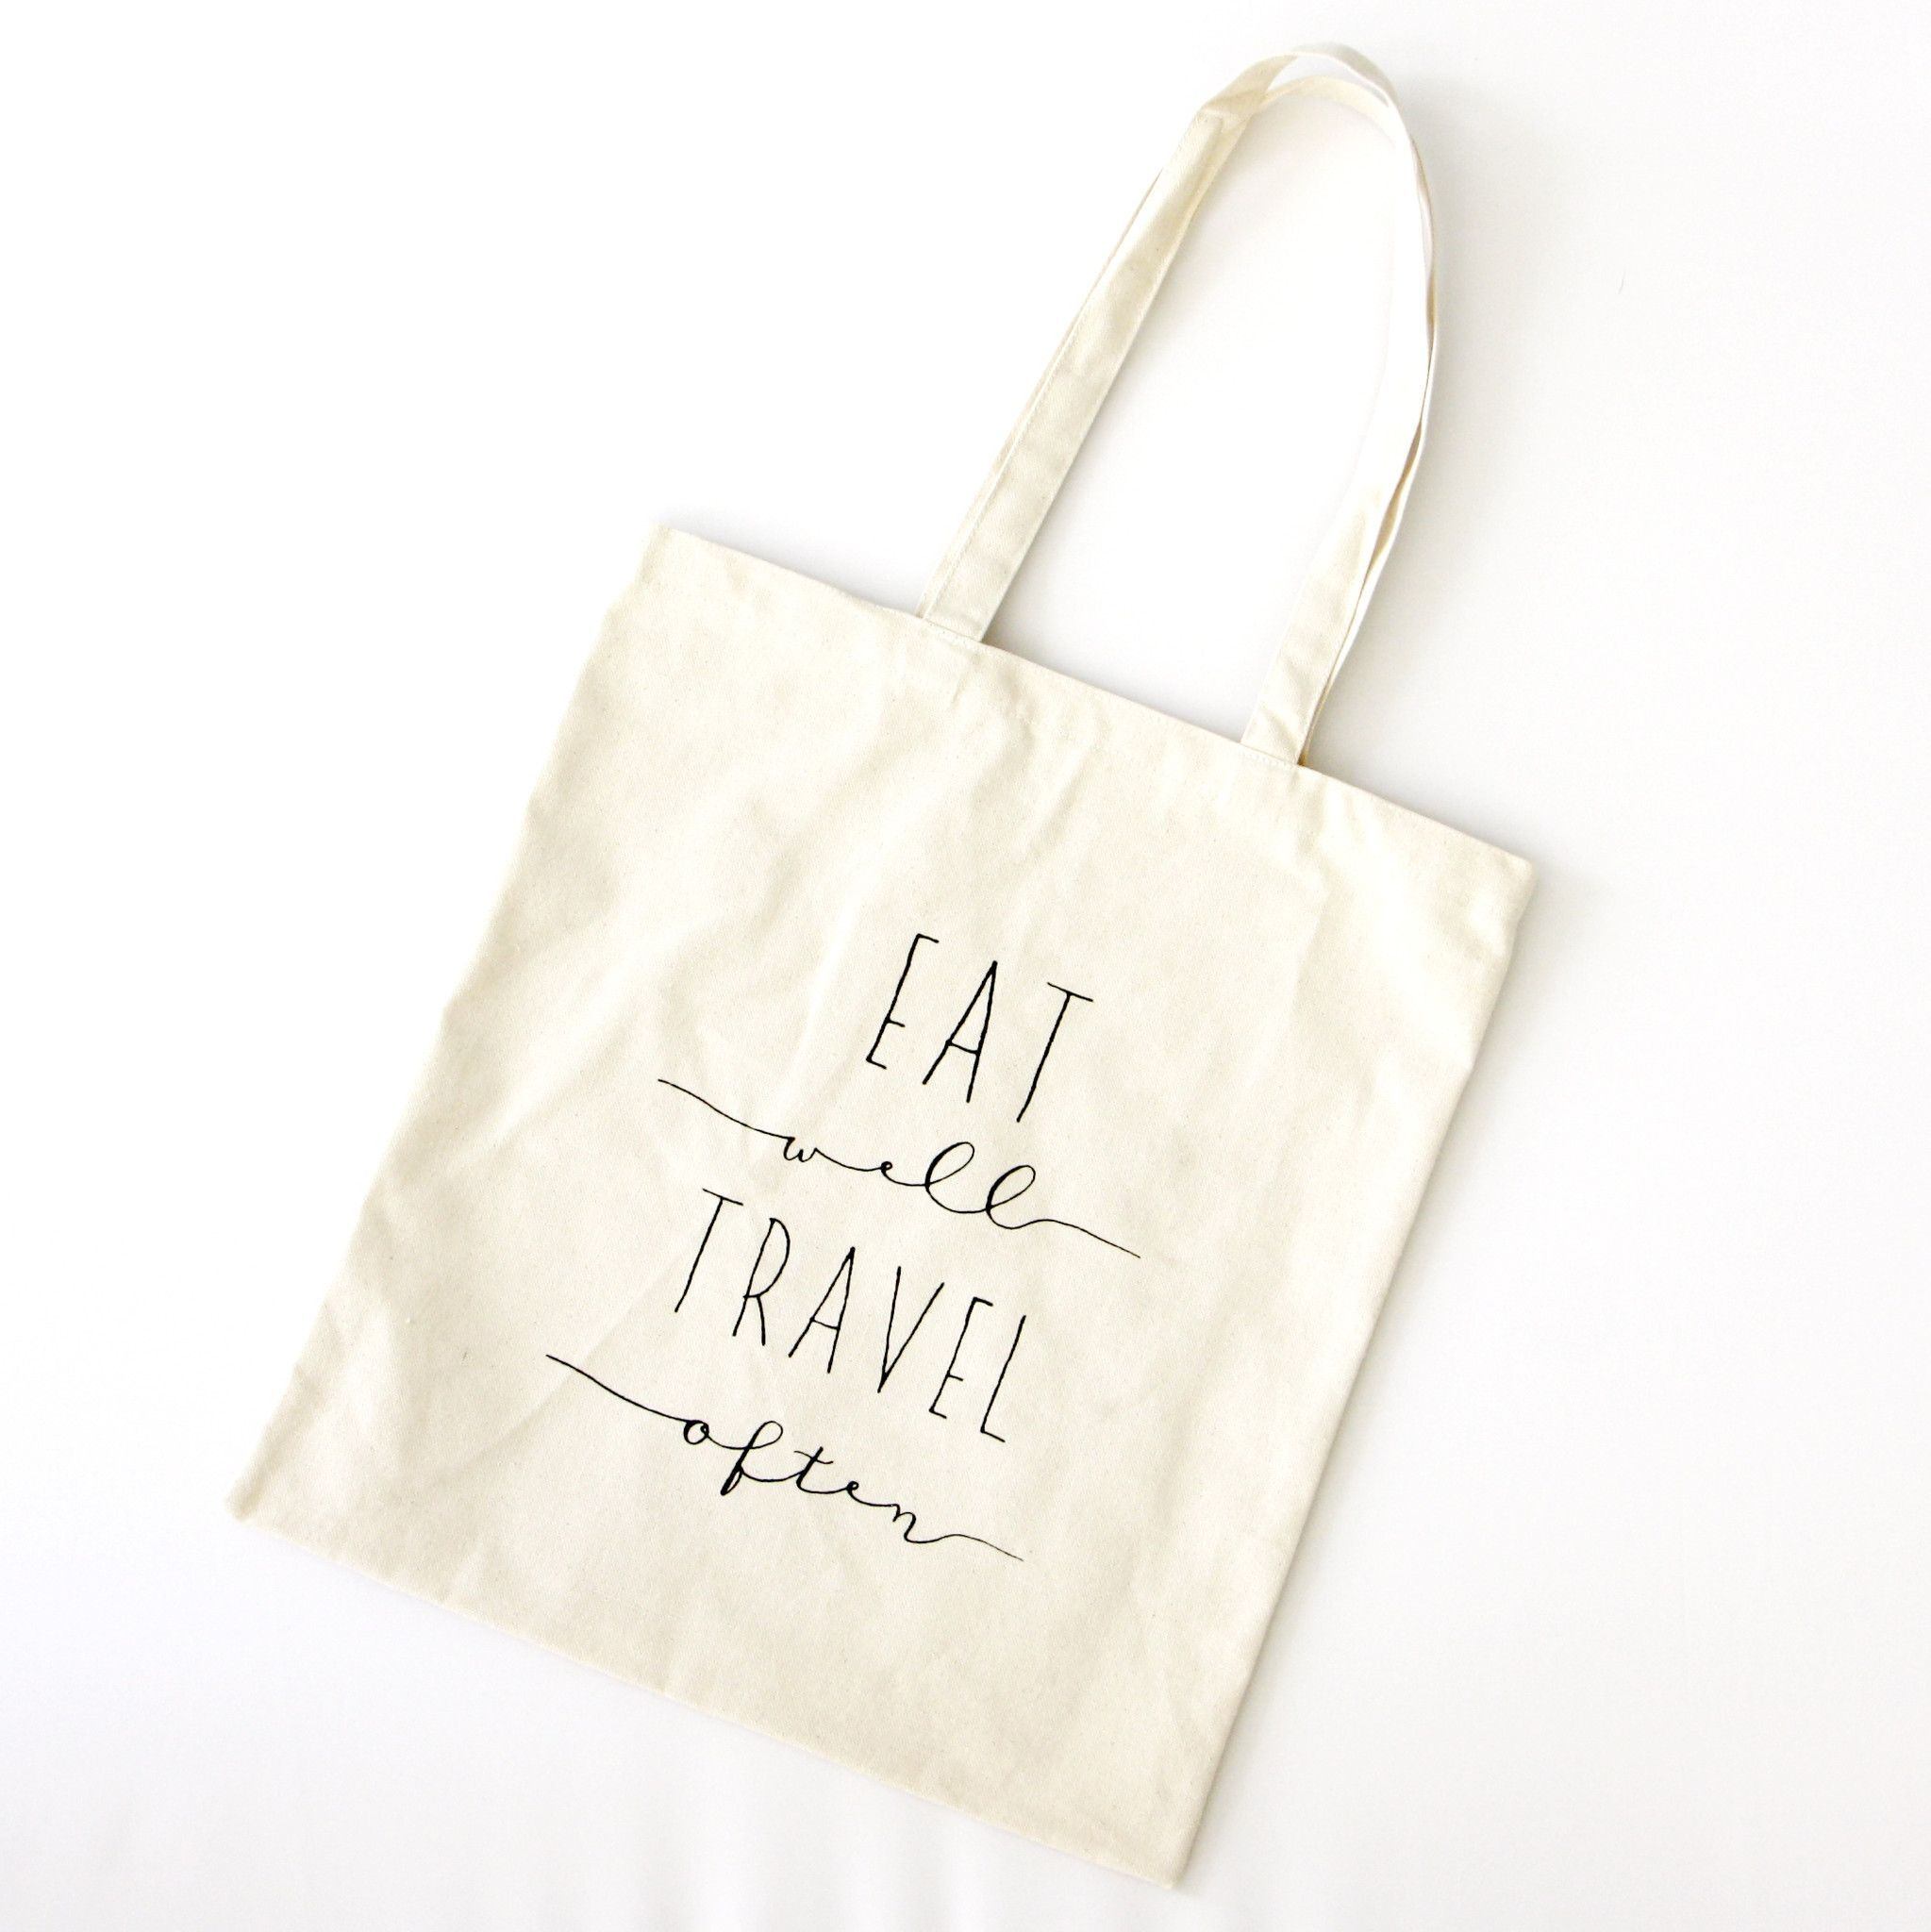 c/'est la vie tote bag  quote tote bag   reusable bag  canvas tote bag  tote bag for women  shopping bag  french bag